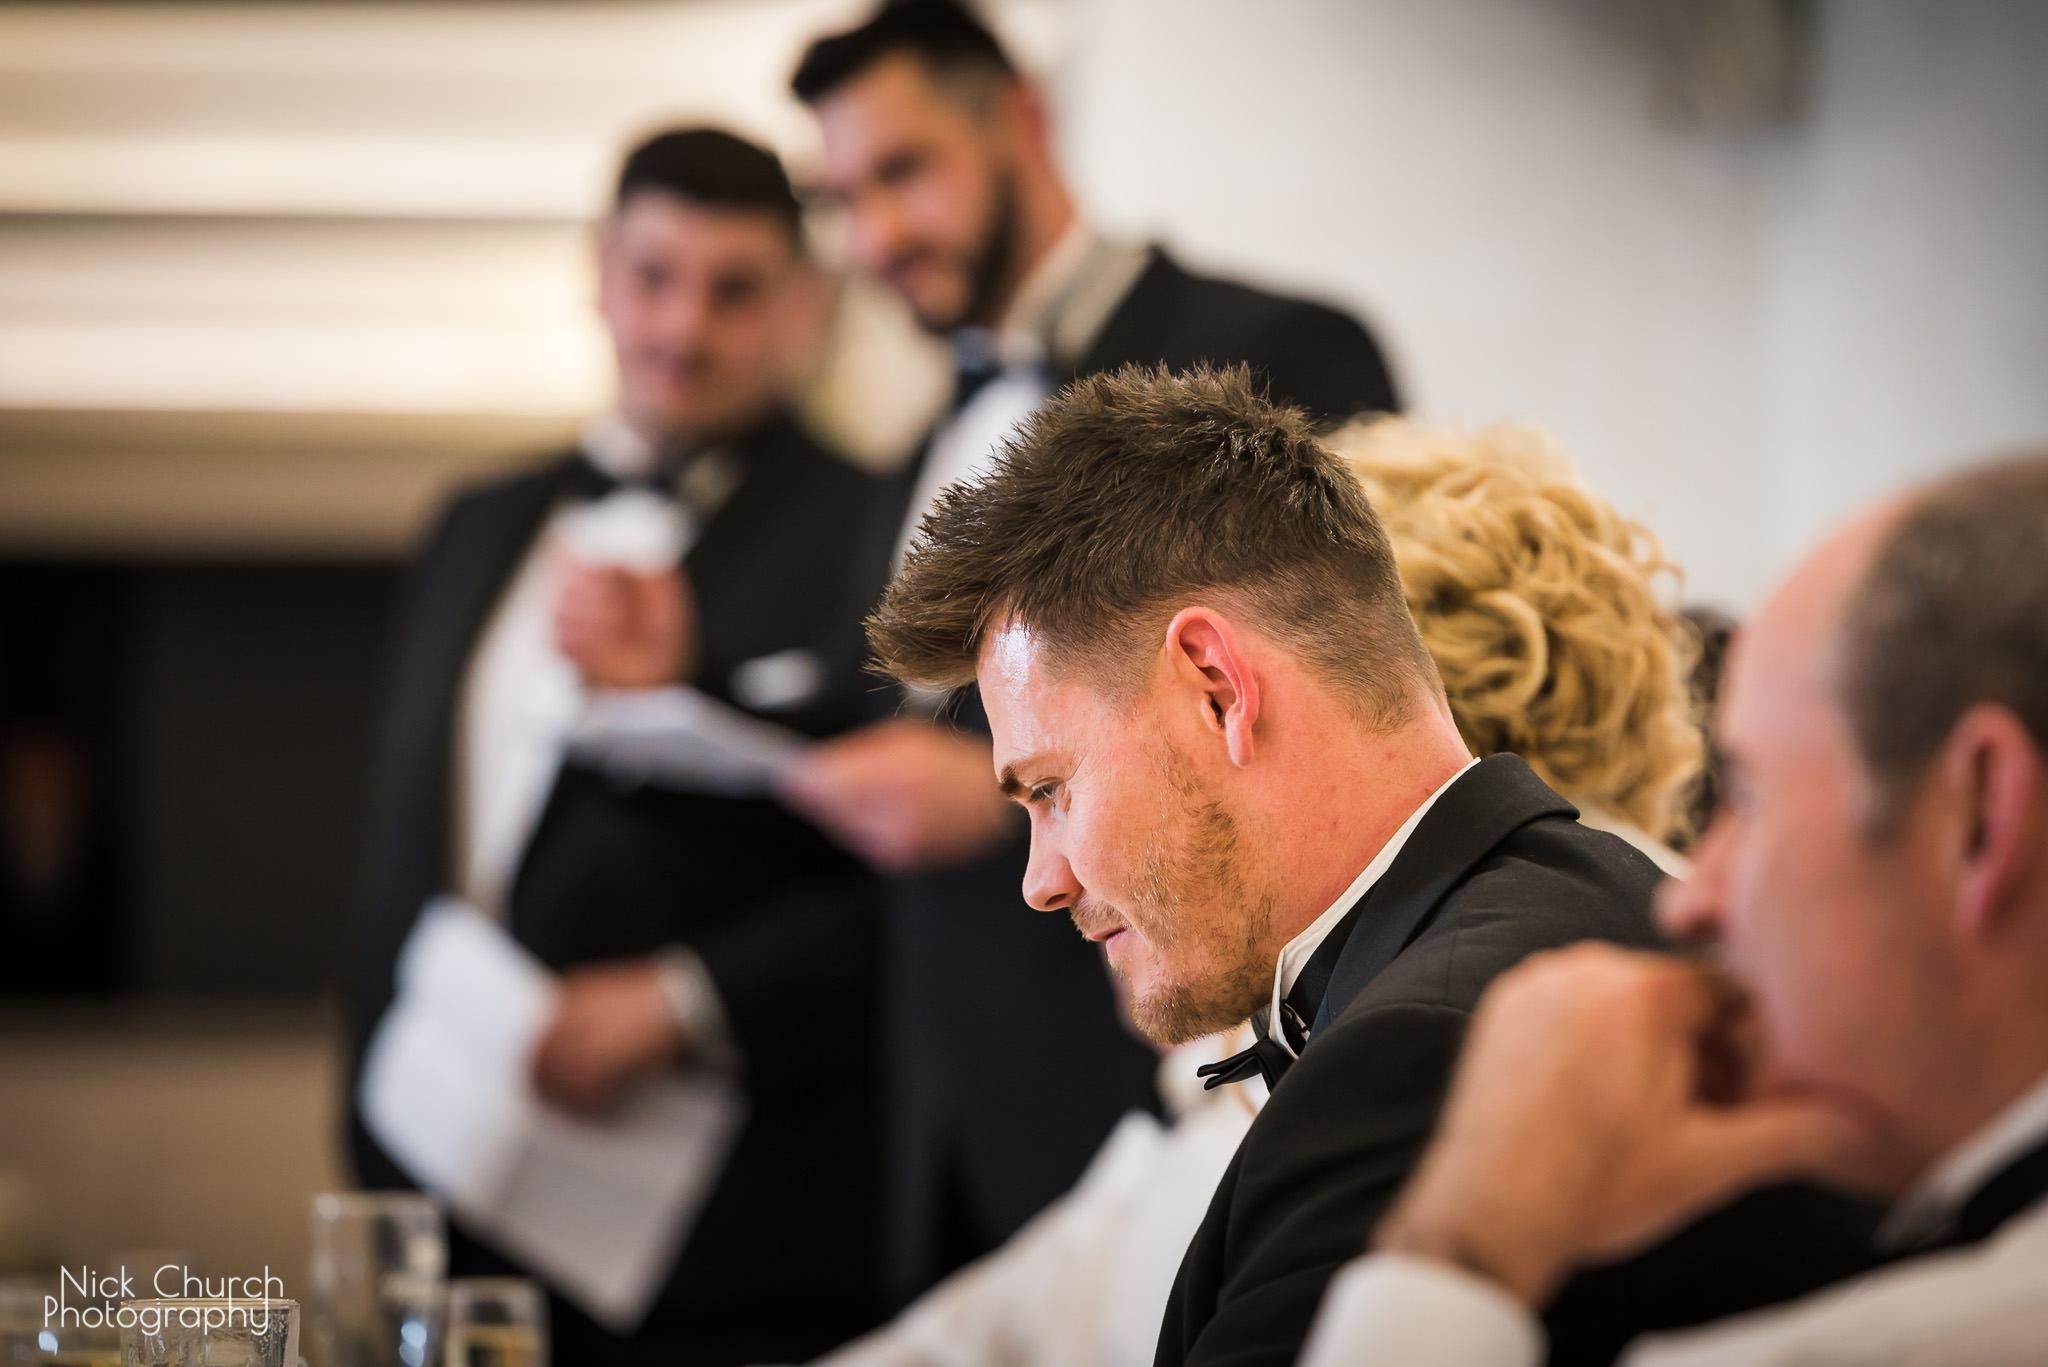 NC-20180317-stacy-and-mike-wedding-1840.jpg